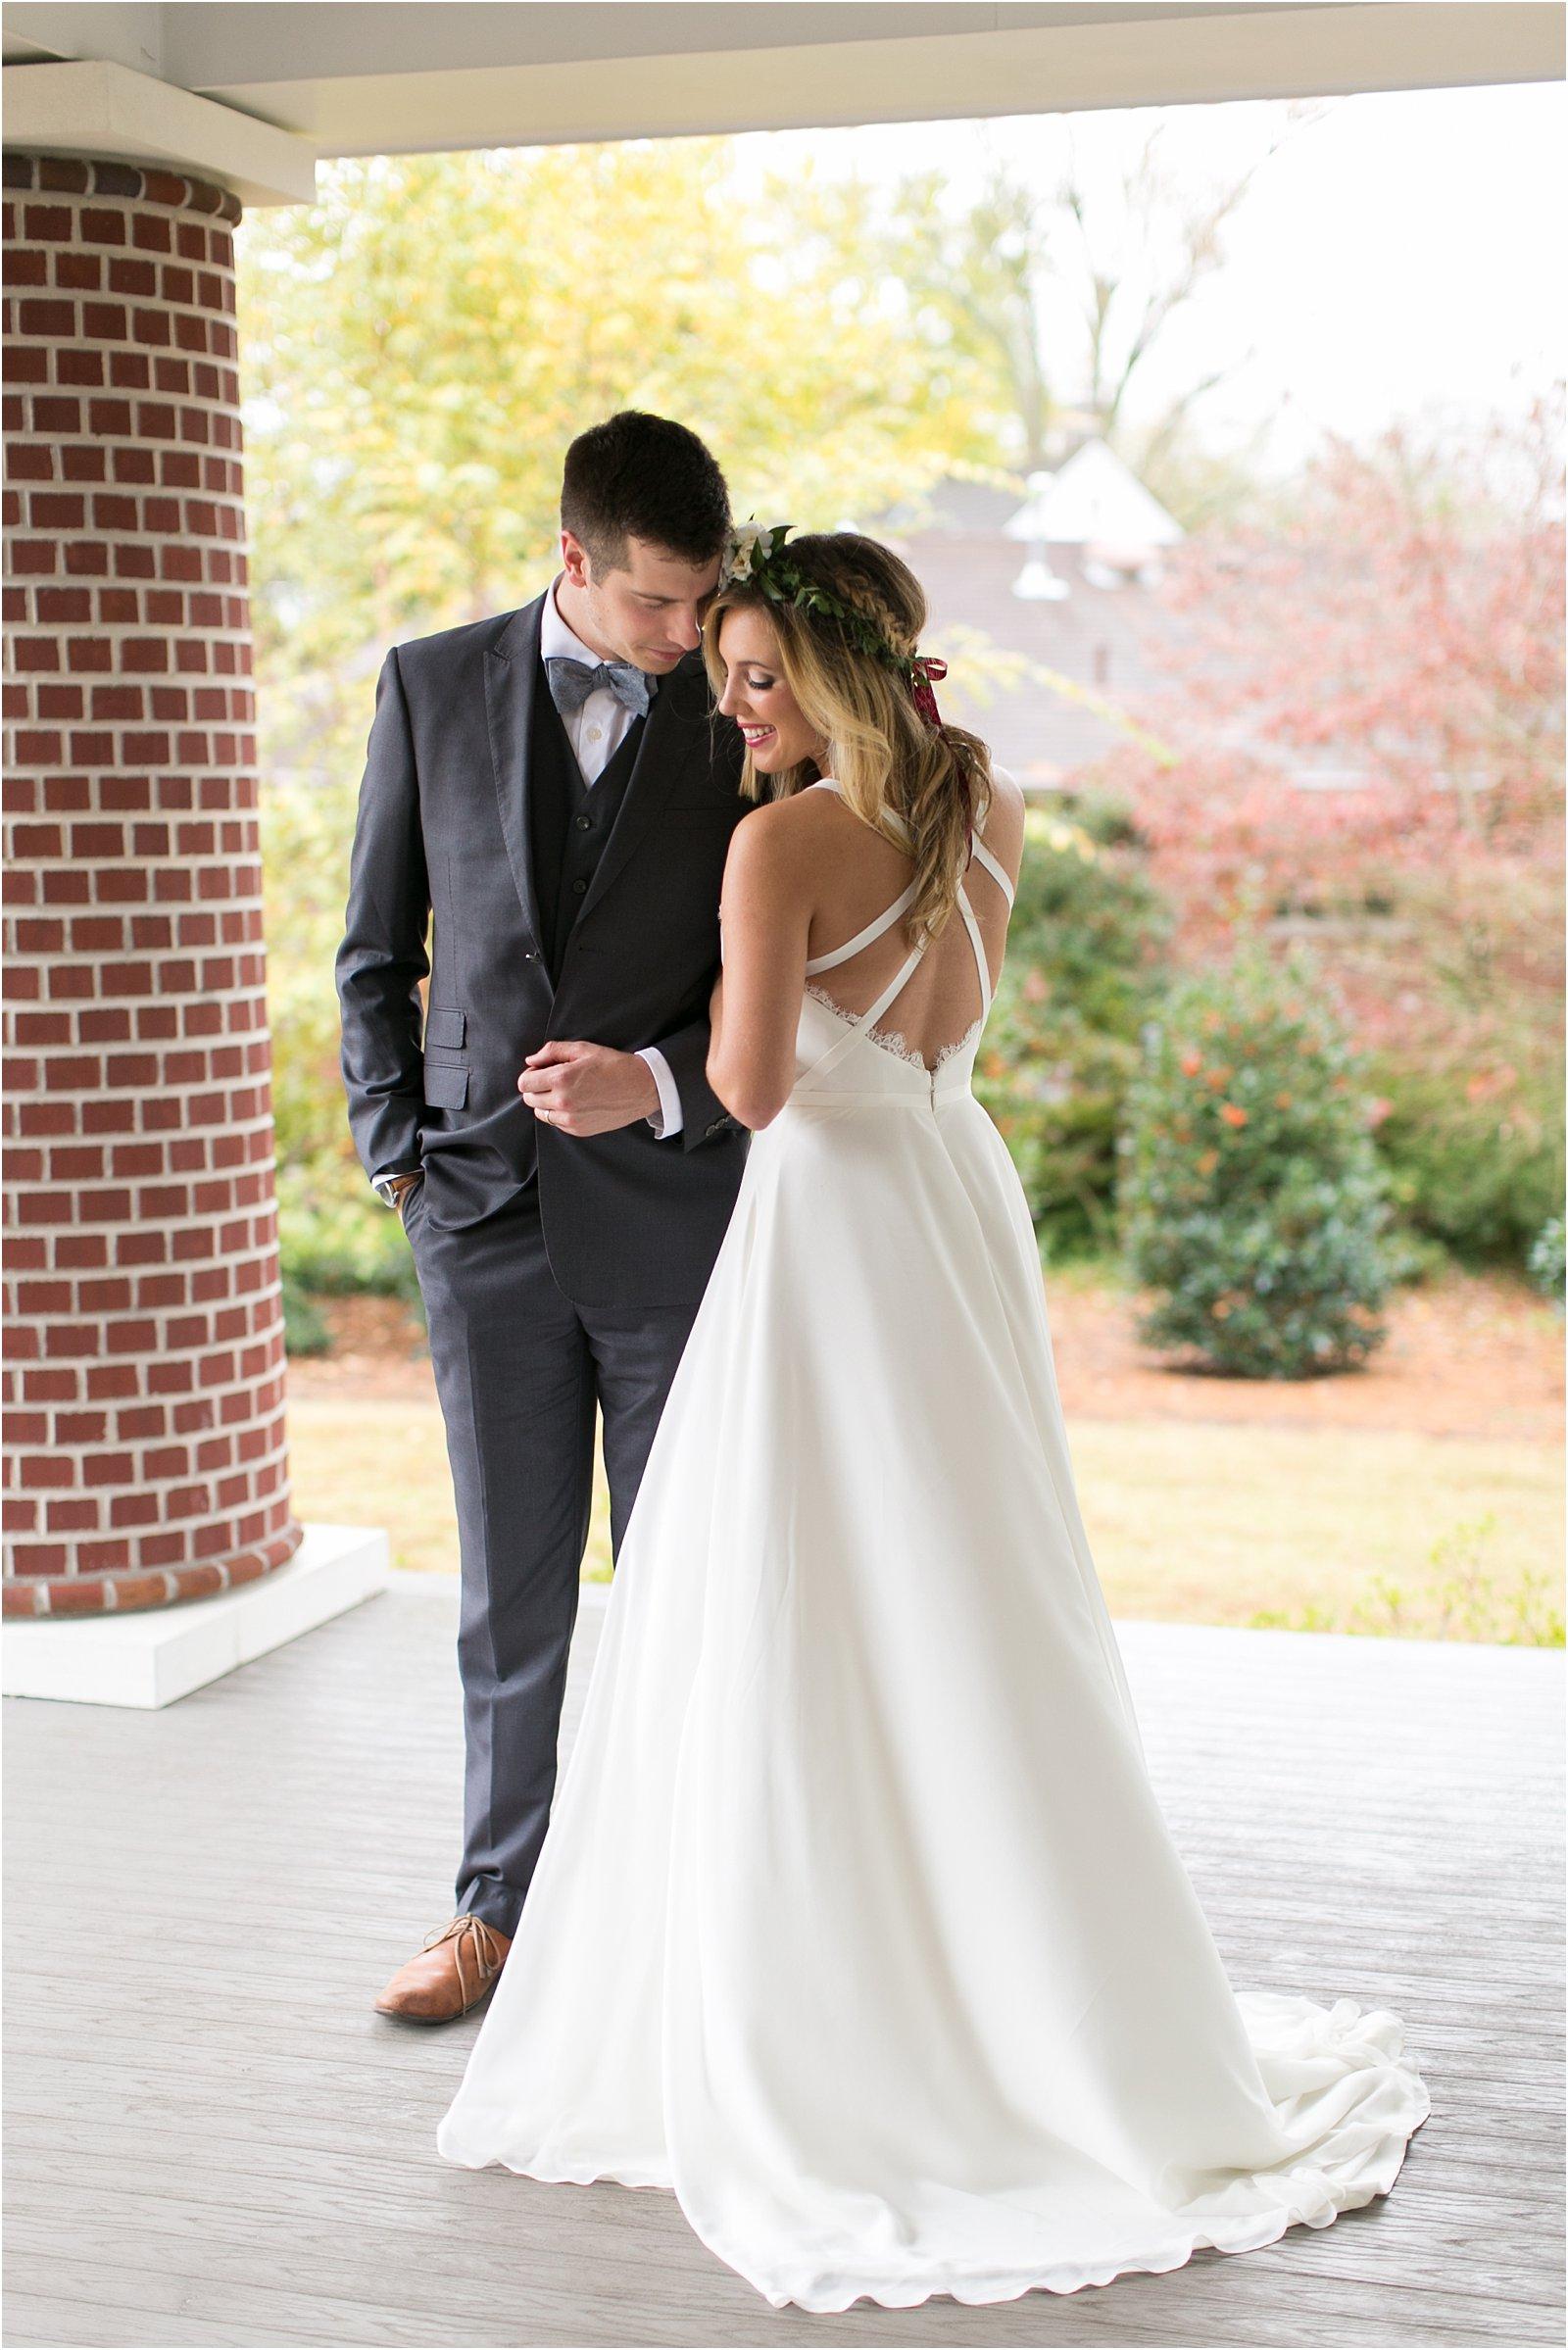 jessica_ryan_photography_womans_club_of_portsmouth_wedding_walk_through_a_wedding_bride_and_groom_0200